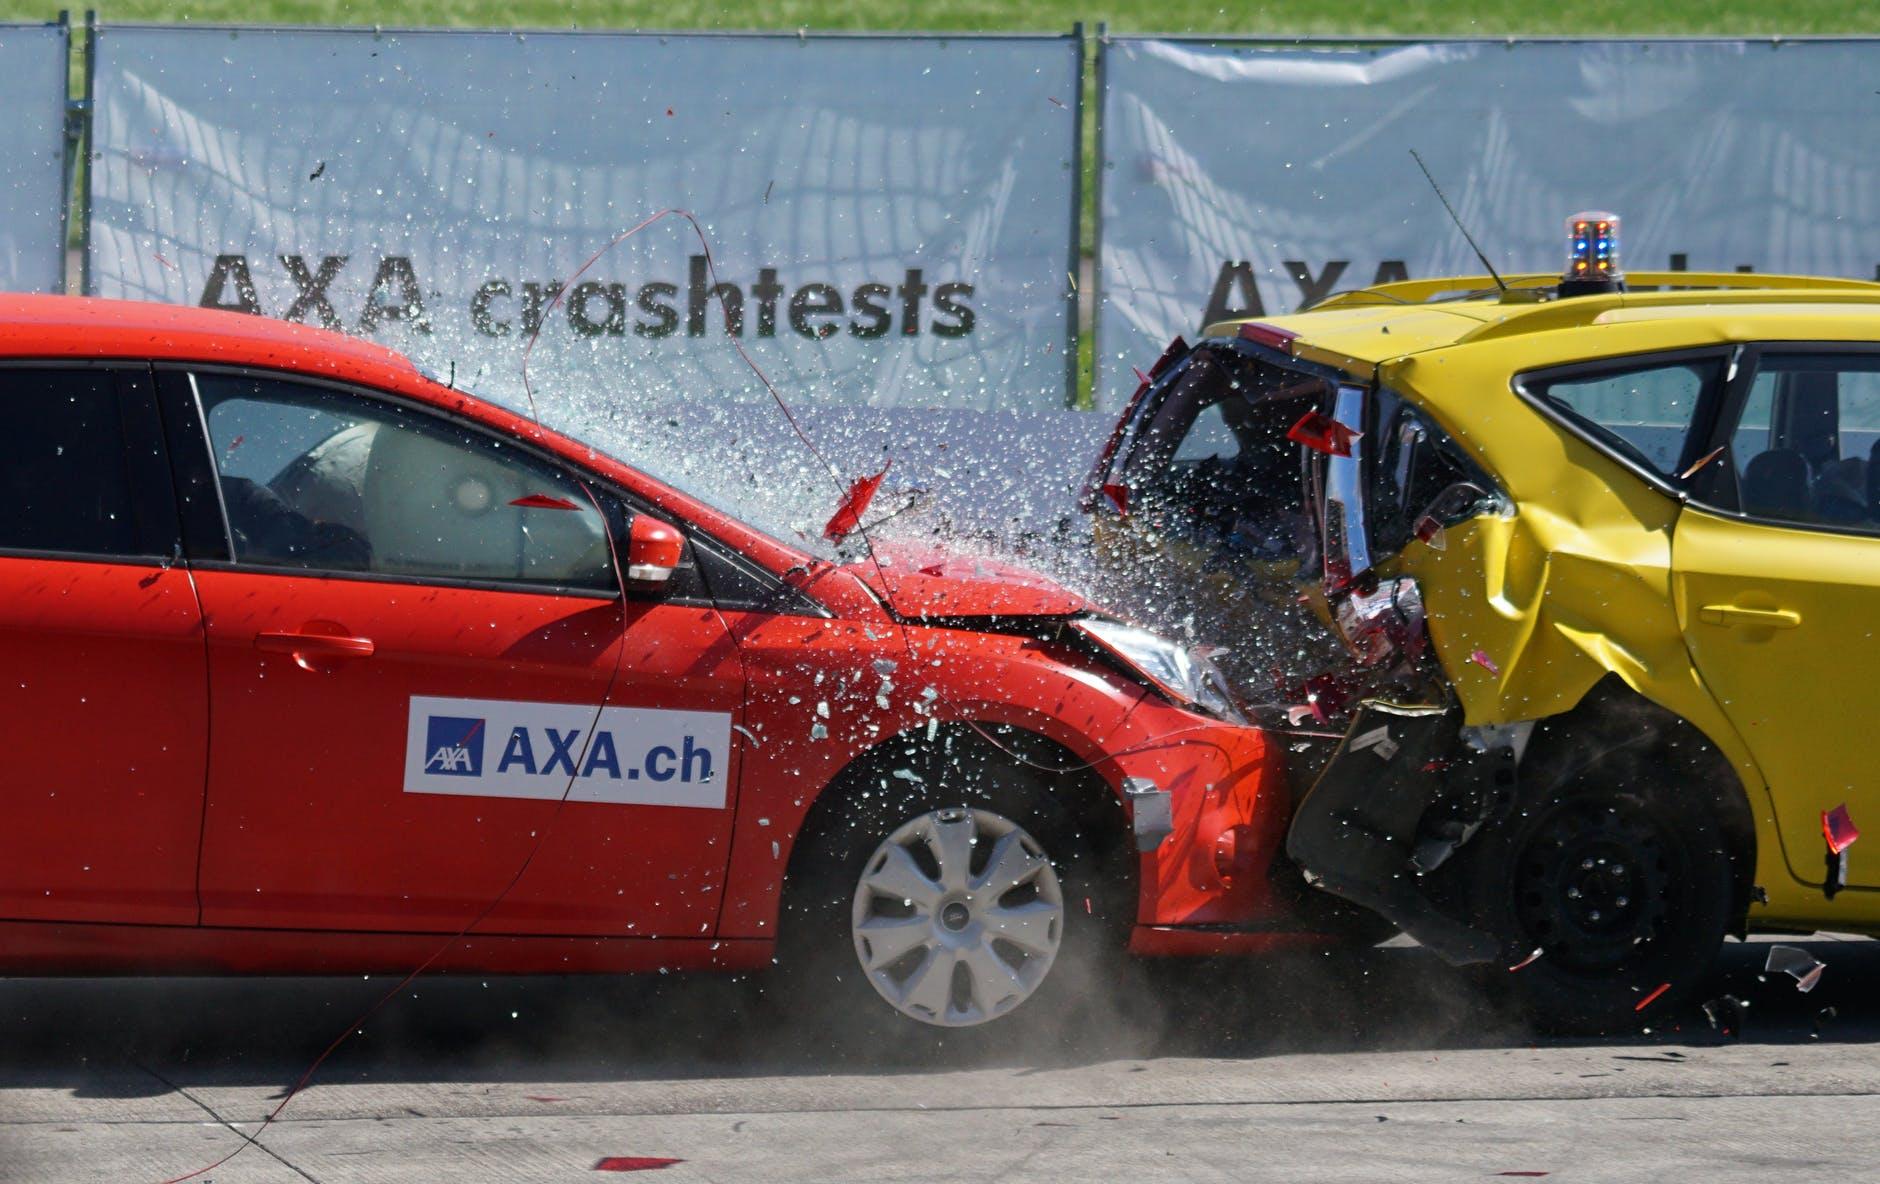 red and yellow hatchback axa crash tests